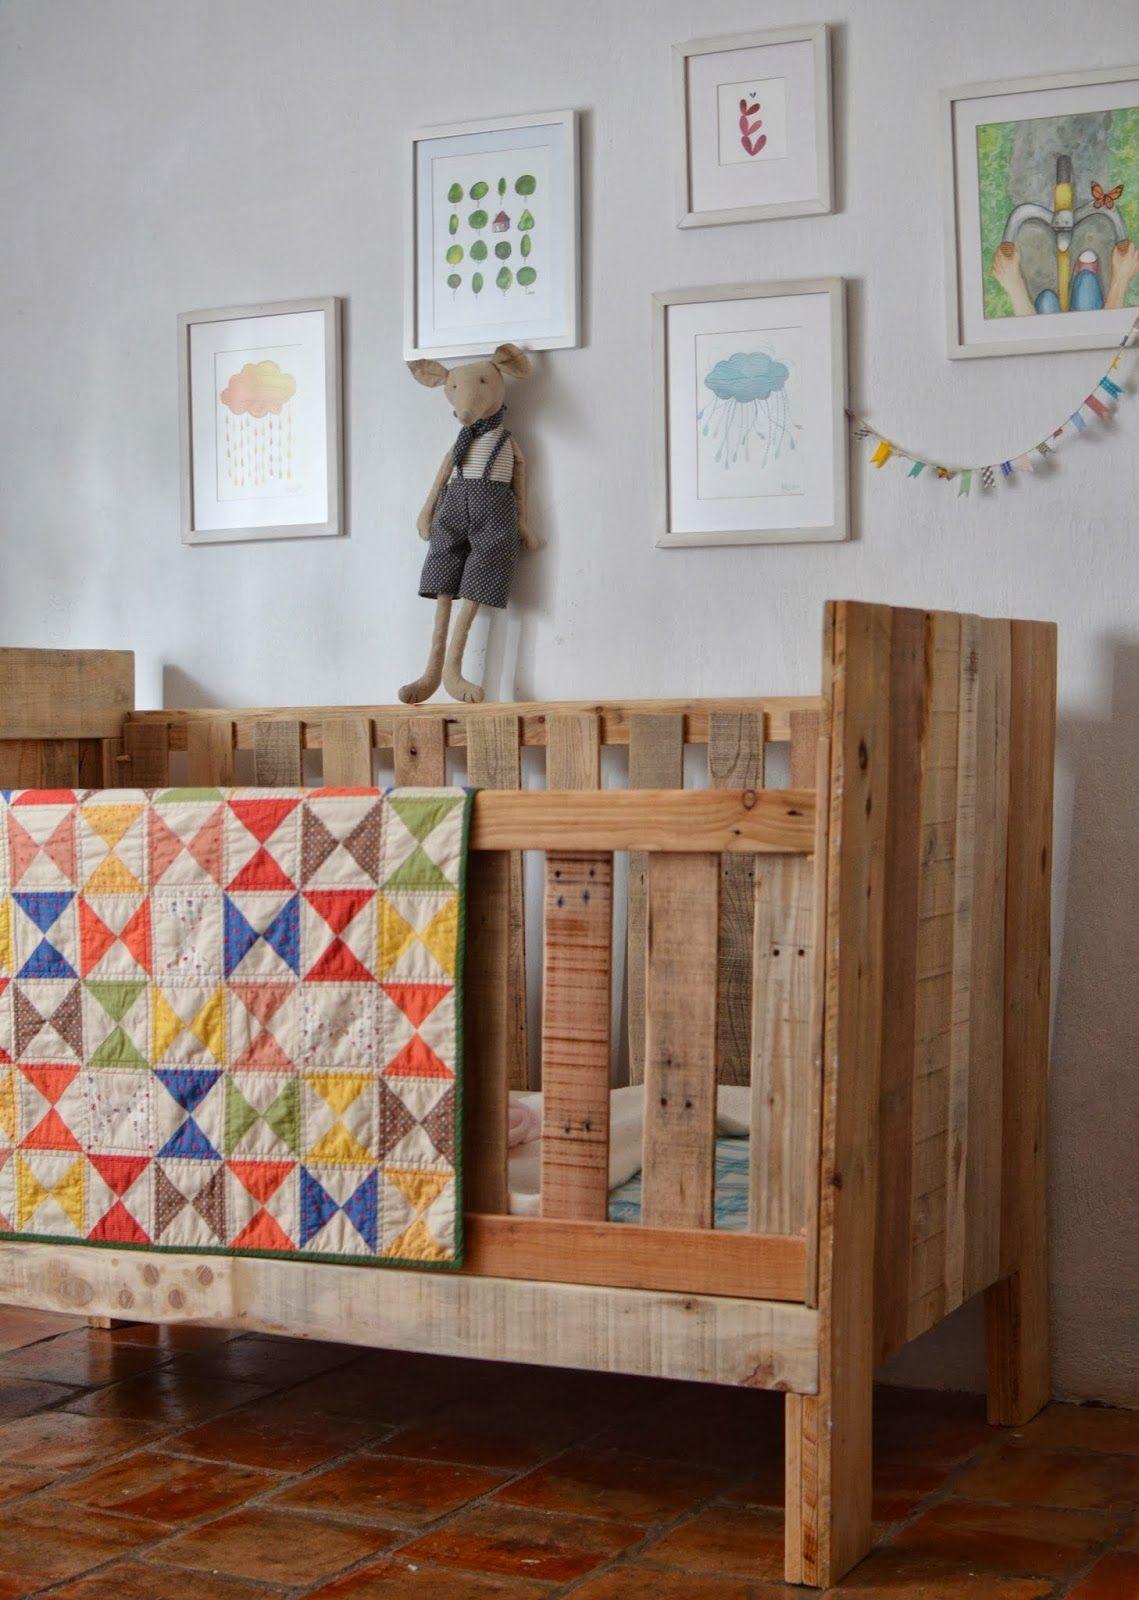 Baby Bedroom Furniture Sets: La Vida Compartida...: Darling Hourglass Quilt